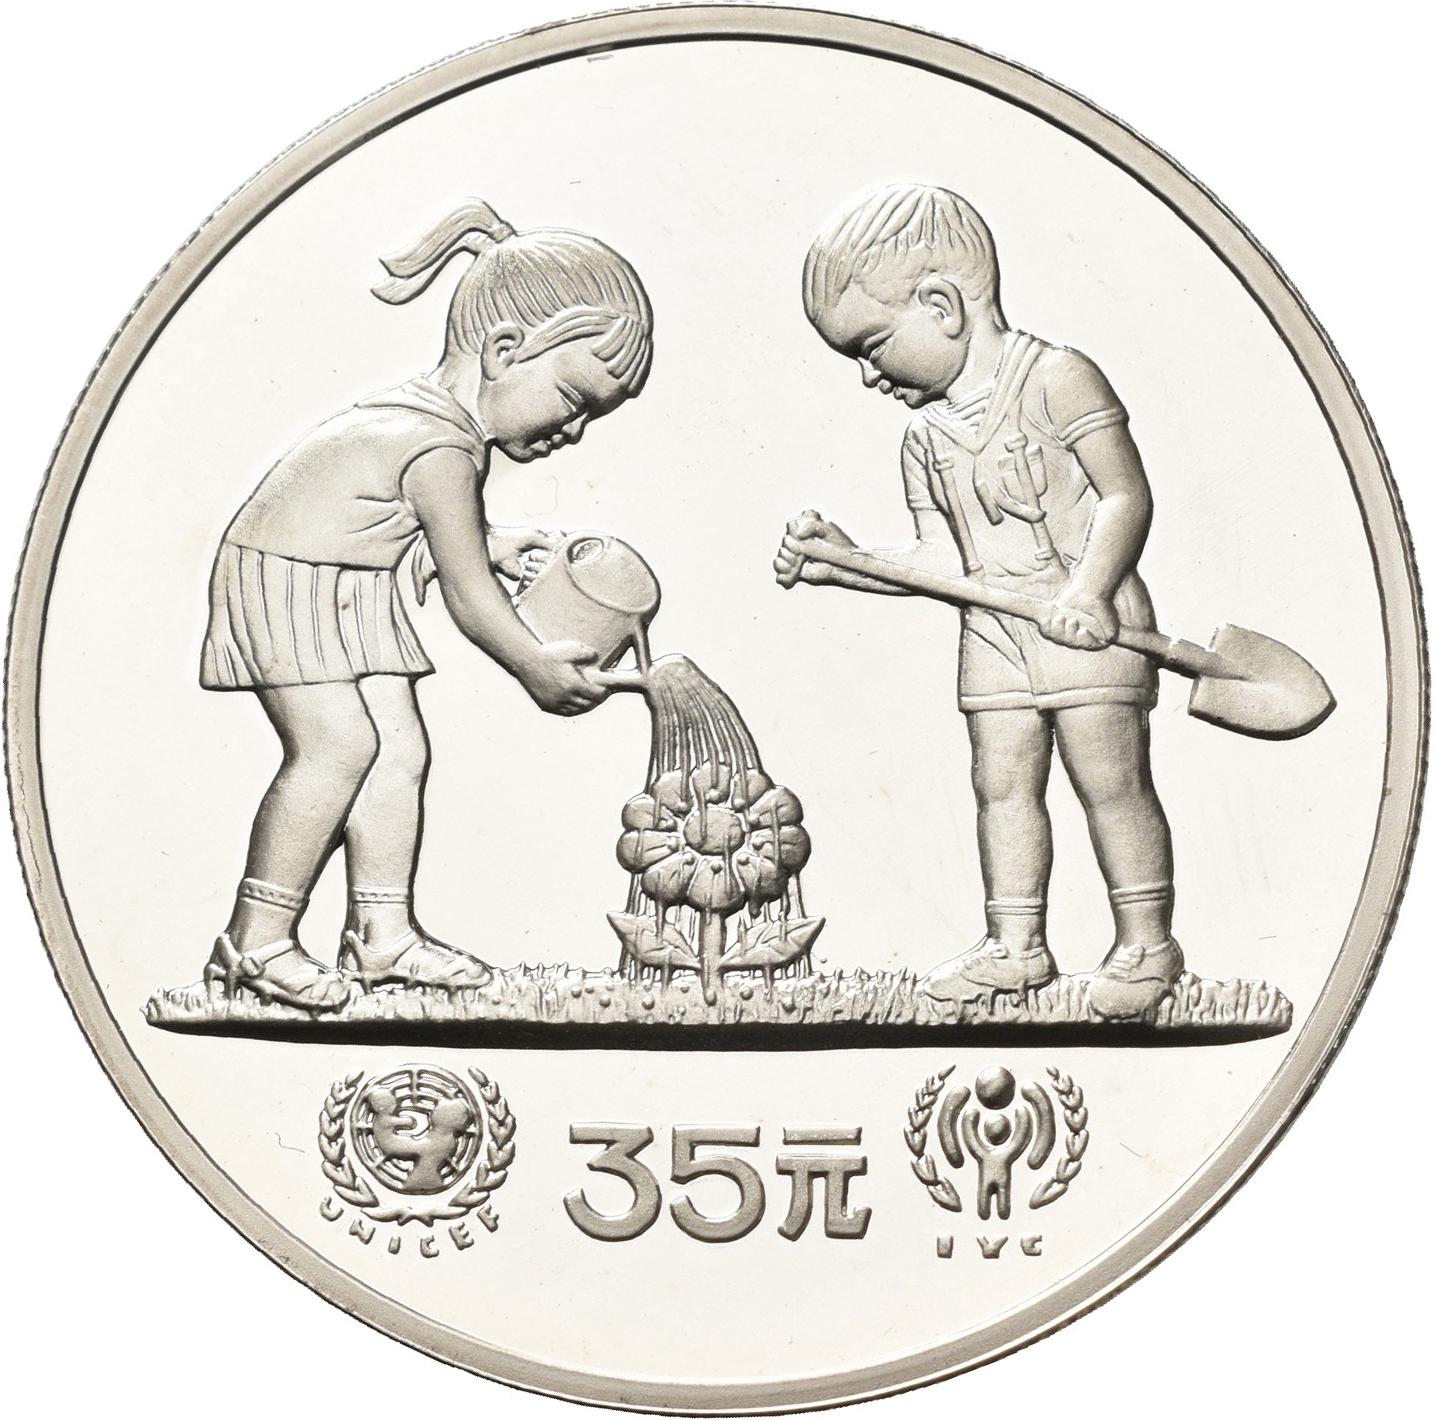 Lot 01044 - China - Volksrepublik   Übersee  -  Auktionshaus Christoph Gärtner GmbH & Co. KG 51th Auction - Day 1